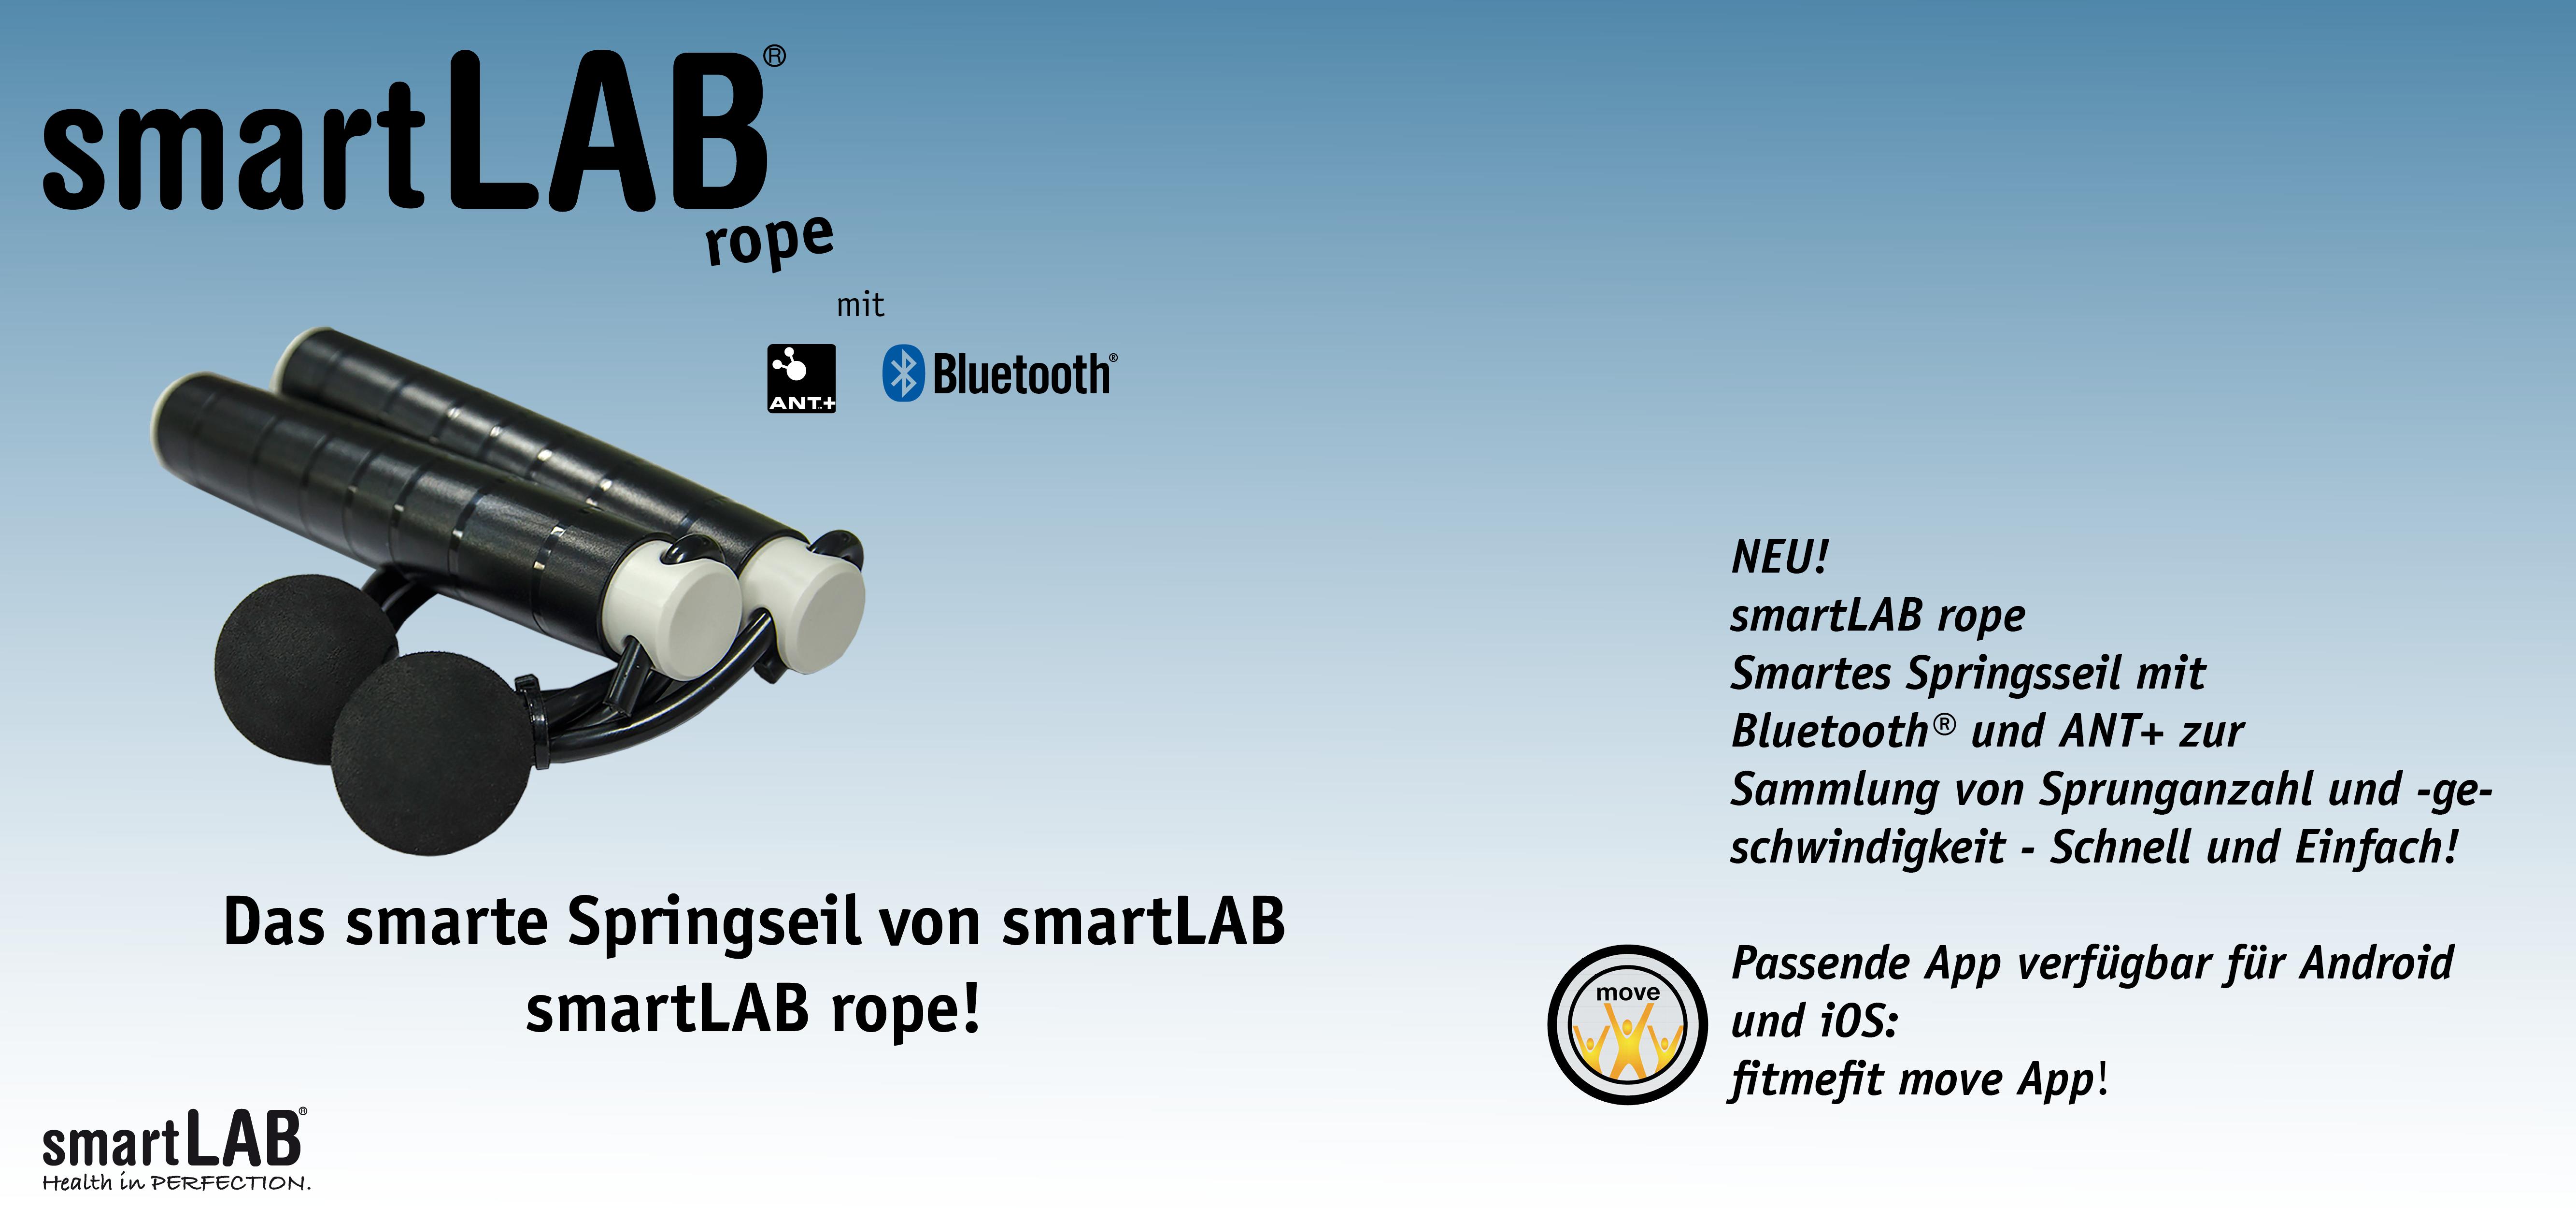 smartLAB rope